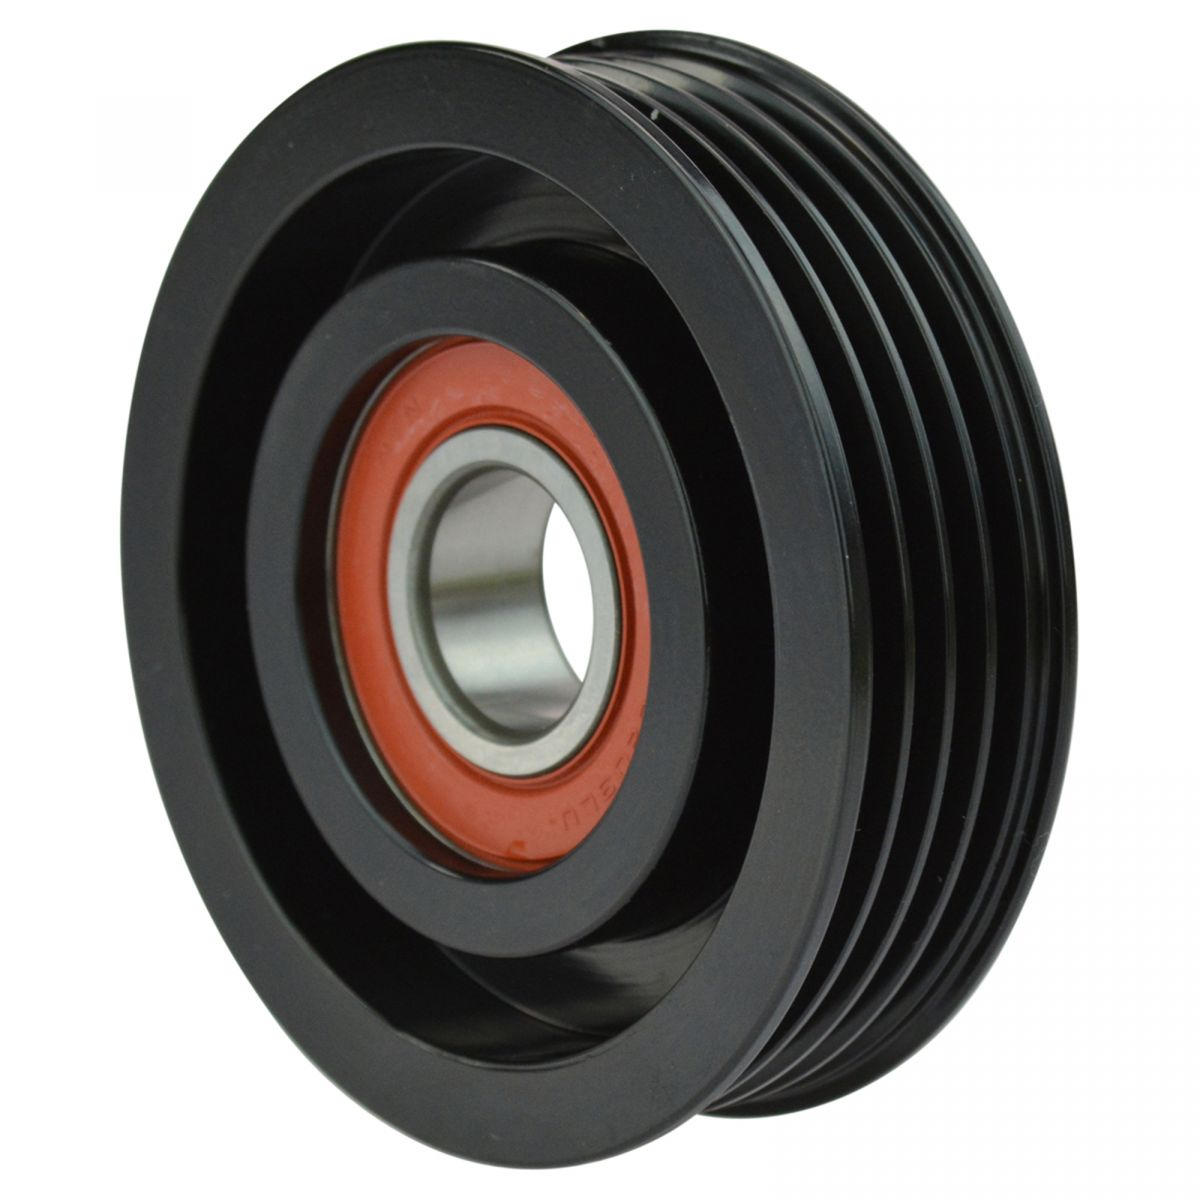 Serpentine Belt Pulley Bearing Noise : Engine idler pulley p for dodge honda mazda